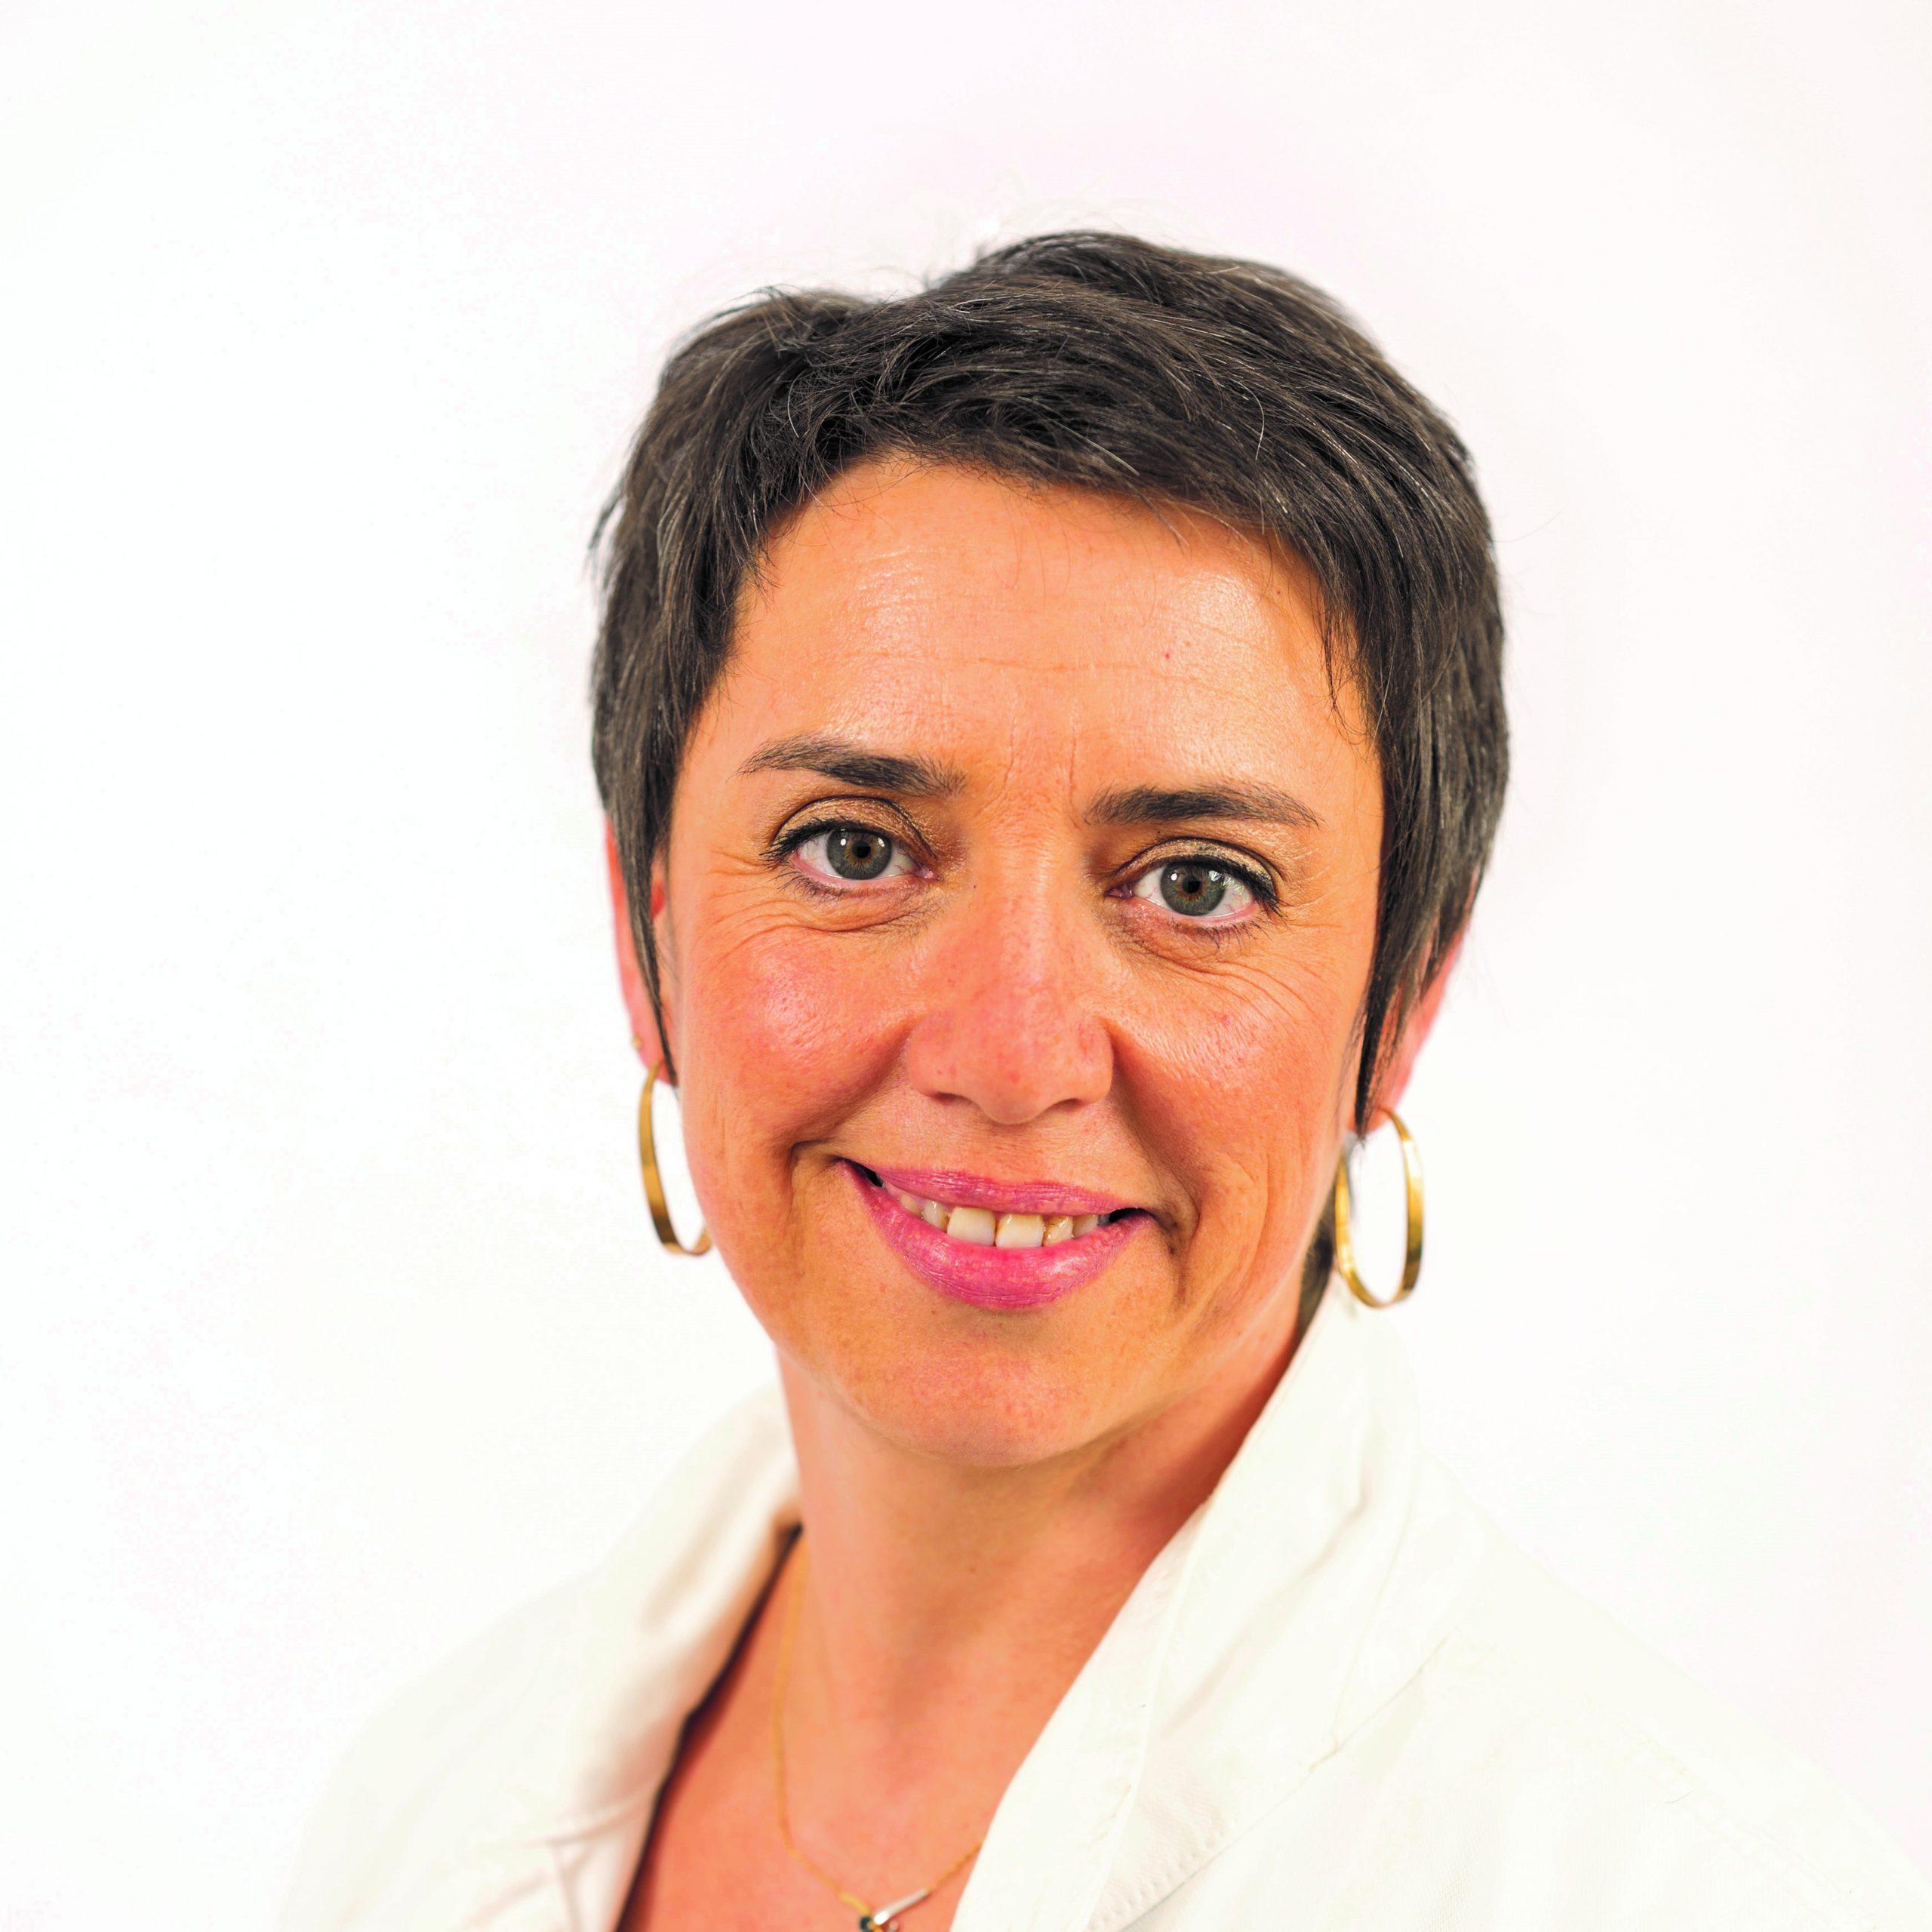 Cécile BARREAU